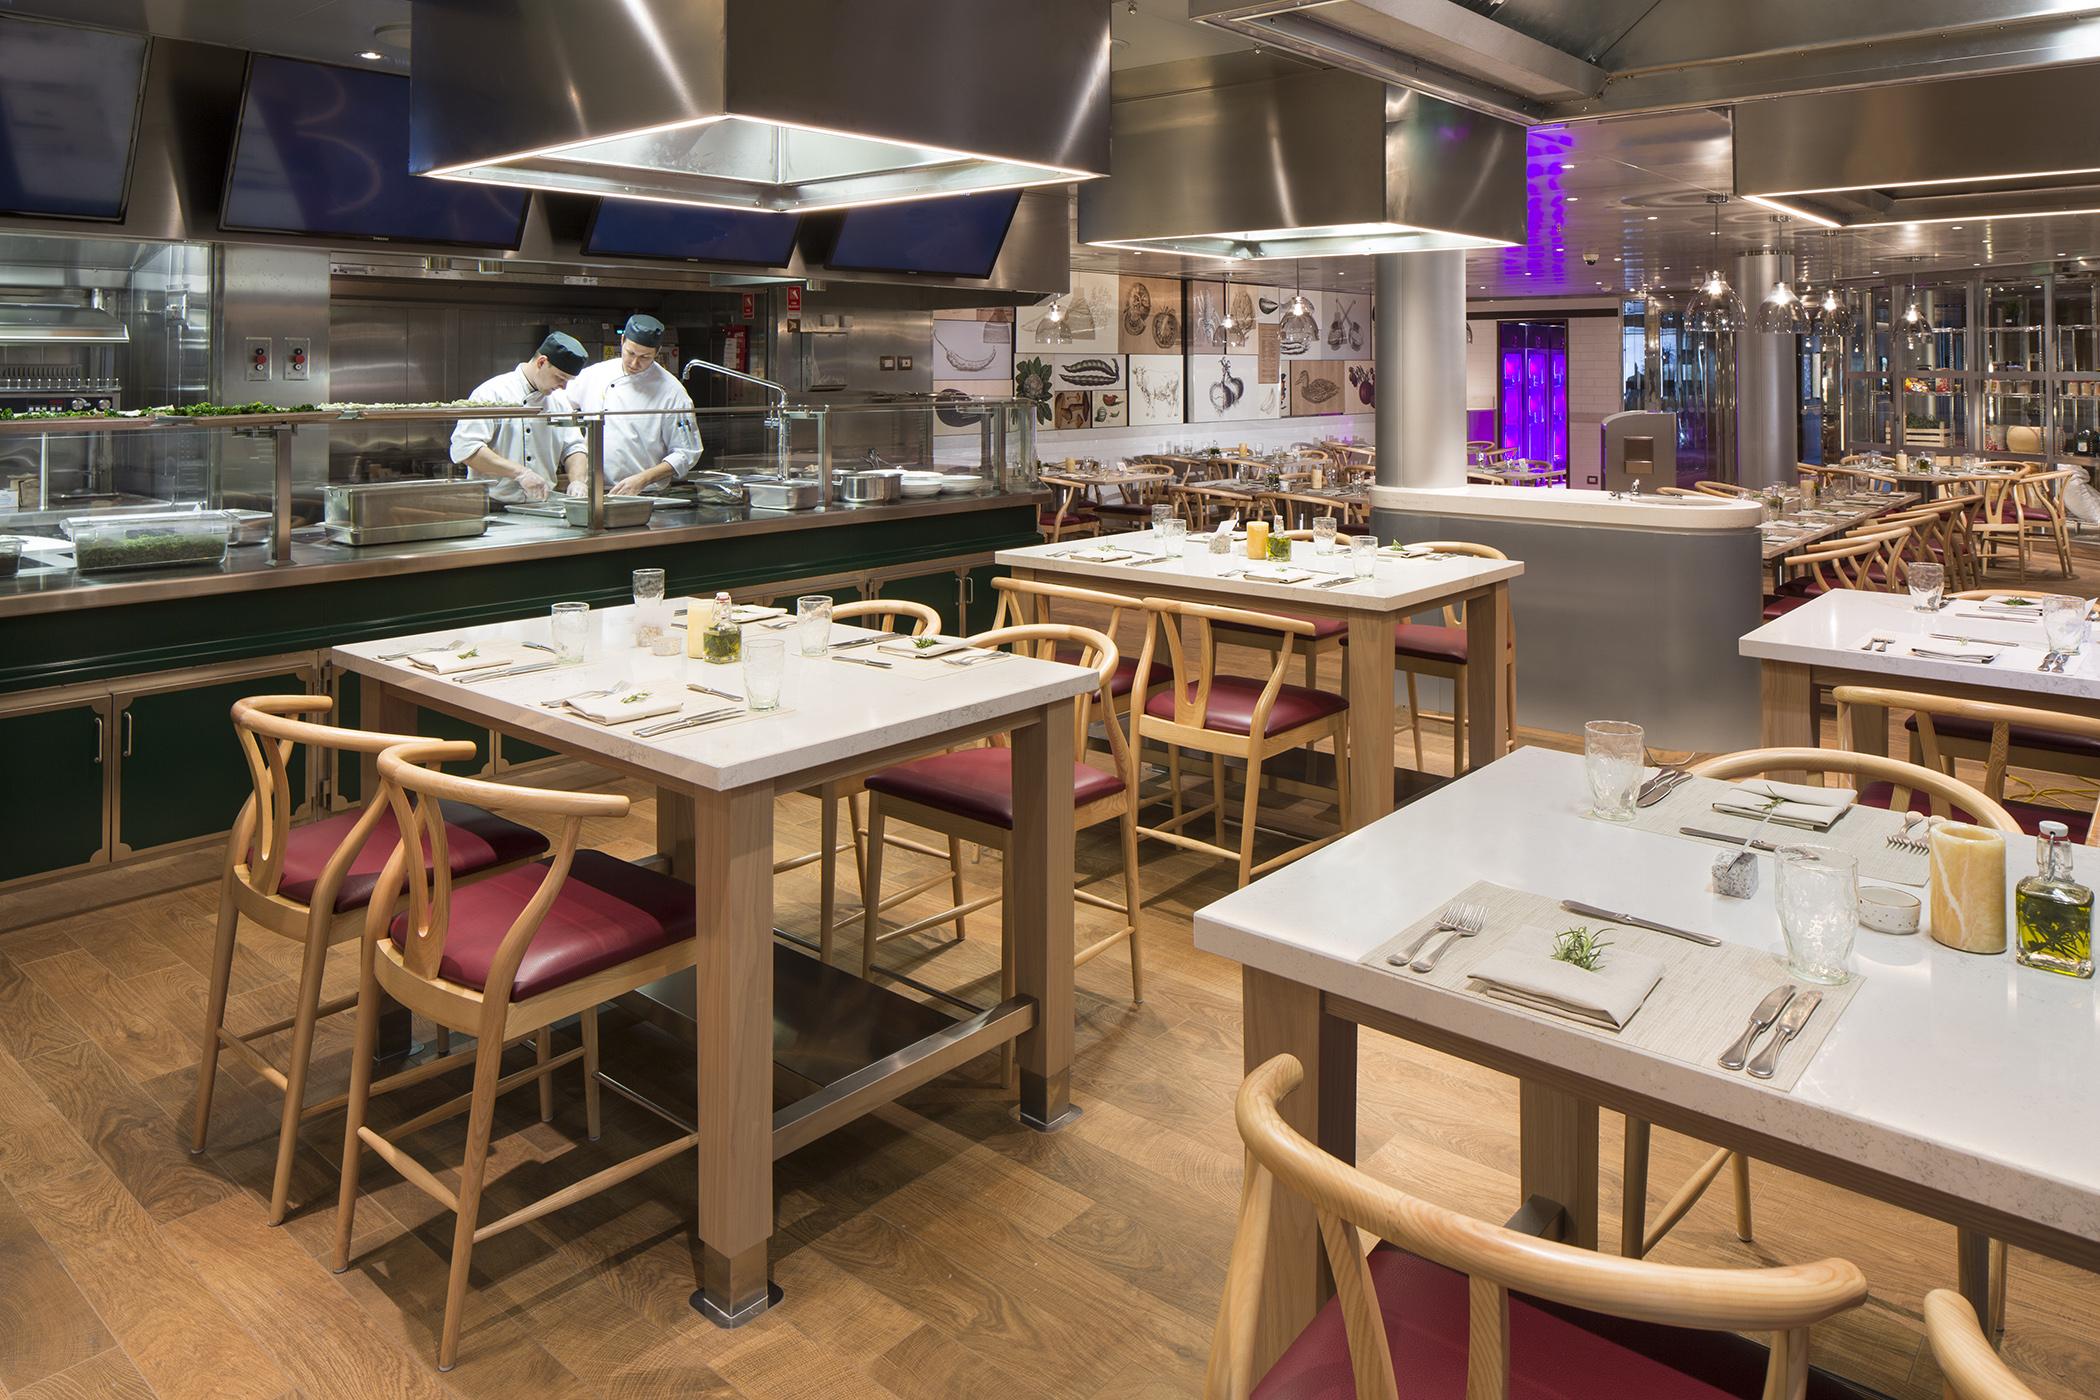 Culinary Art Center - Deck 3 Aft Starboard Koningsdam - Holland America Line